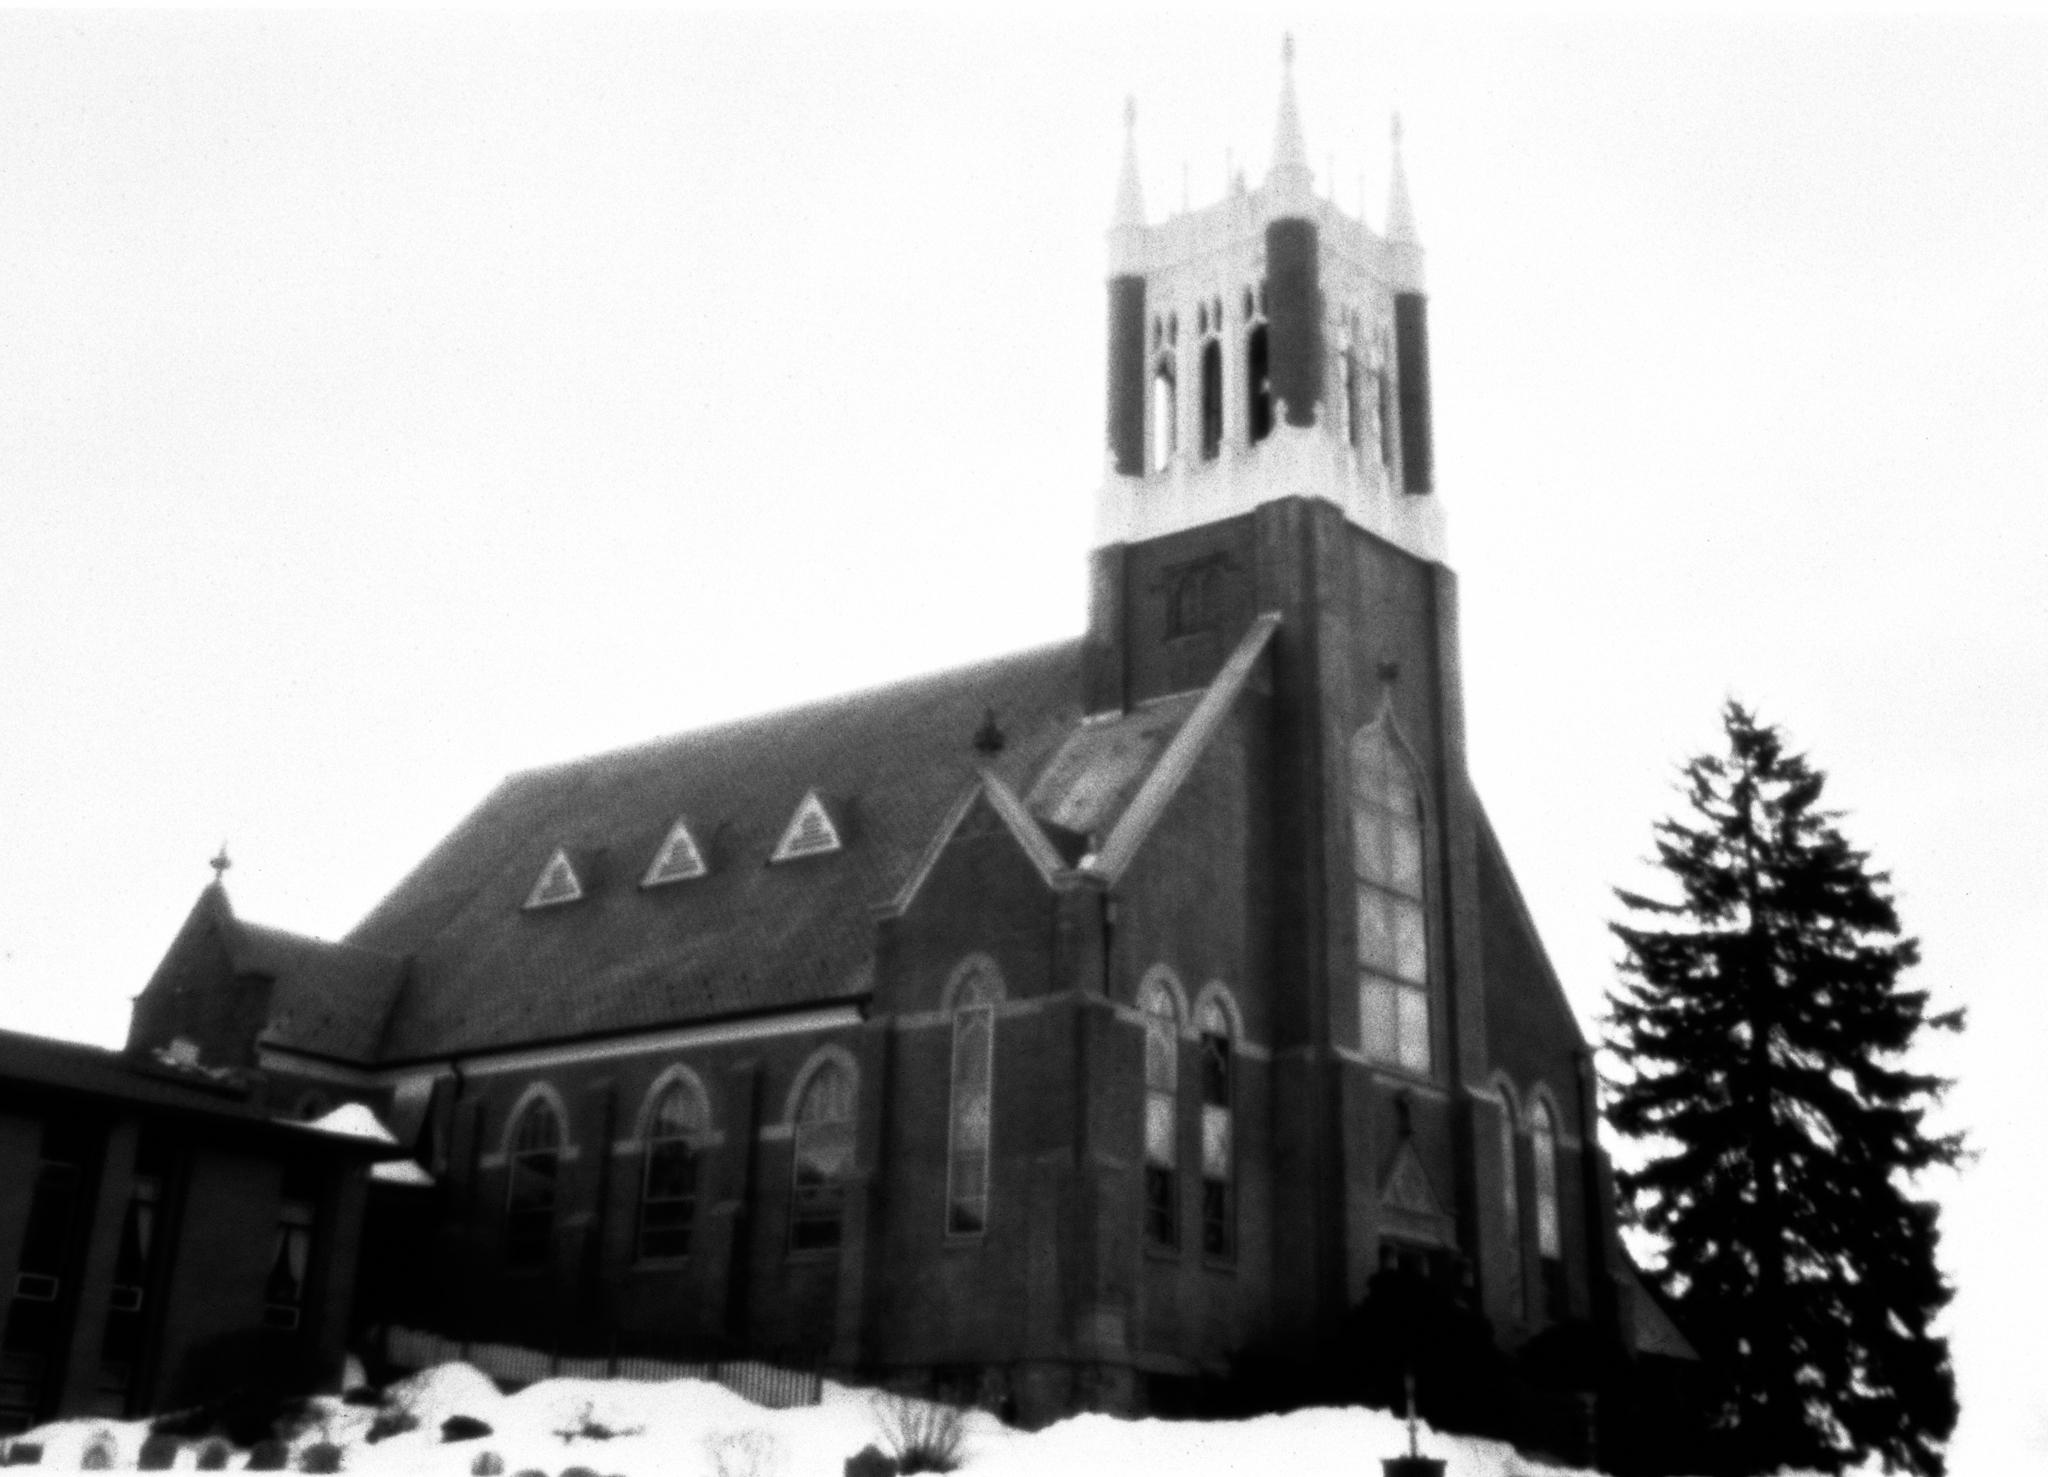 4x5_for_365_project_061_St_Pauls_UCC_Main_Church.jpg